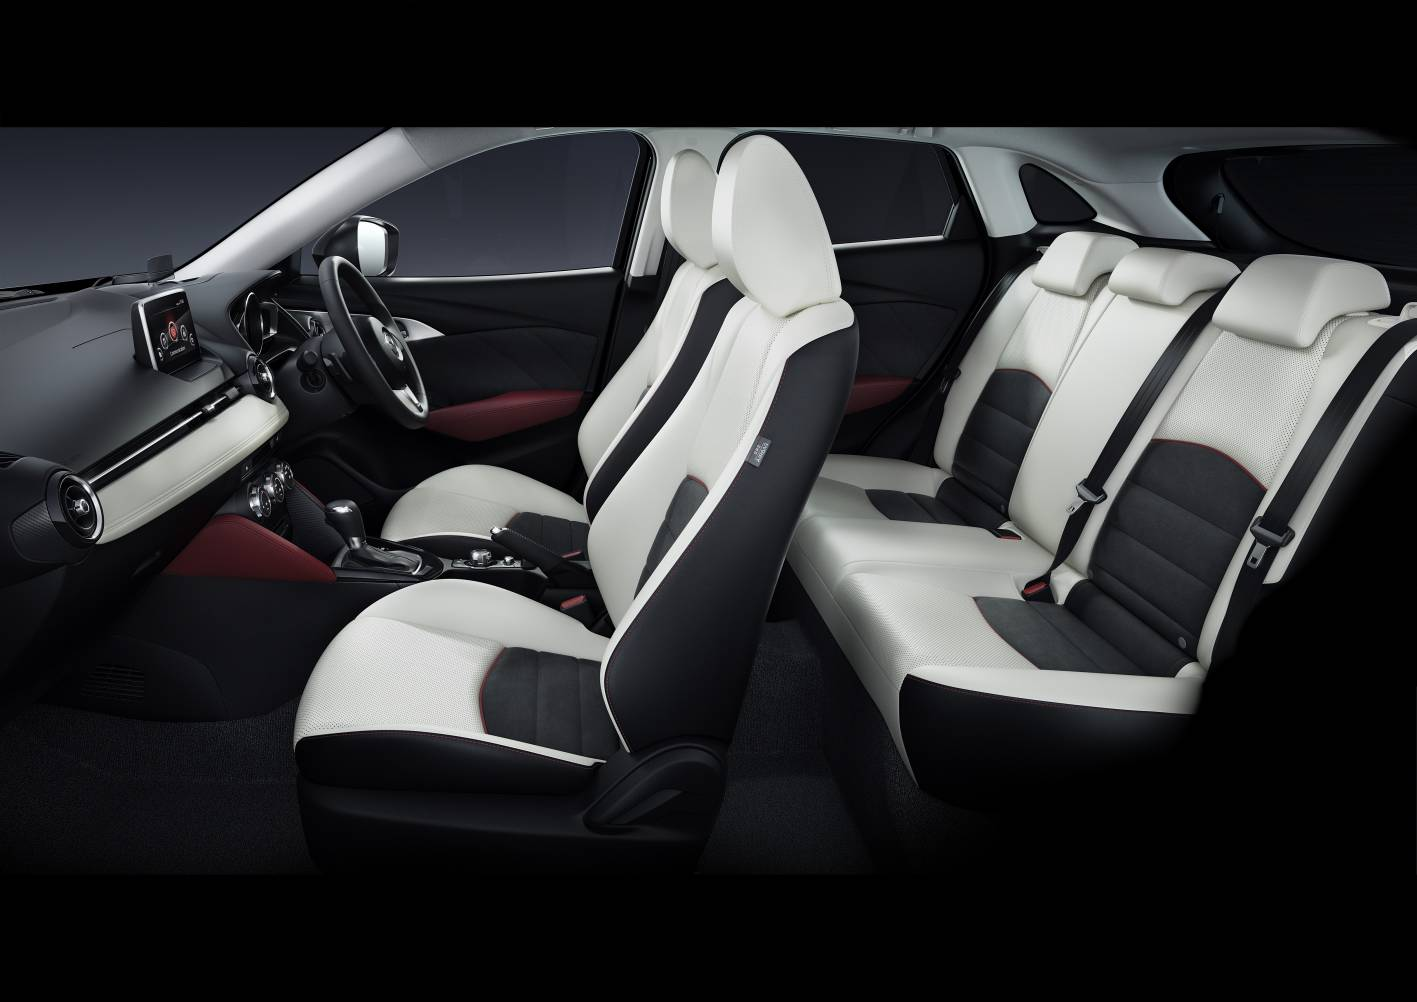 2015 mazda cx 3 unveiled at la auto show performancedrive for Lederen interieur auto